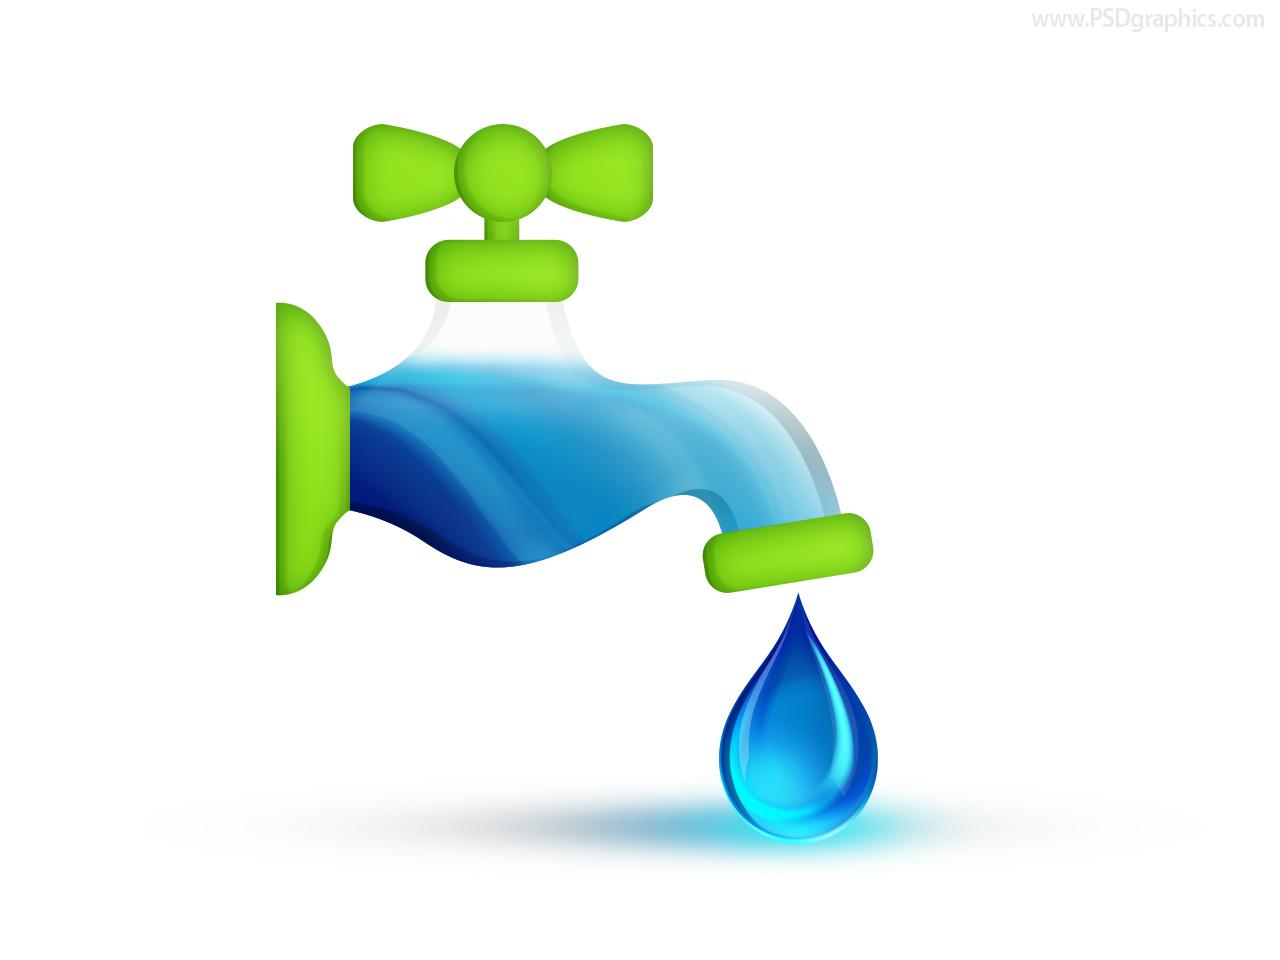 Water icon Full JPG PSDGraphics